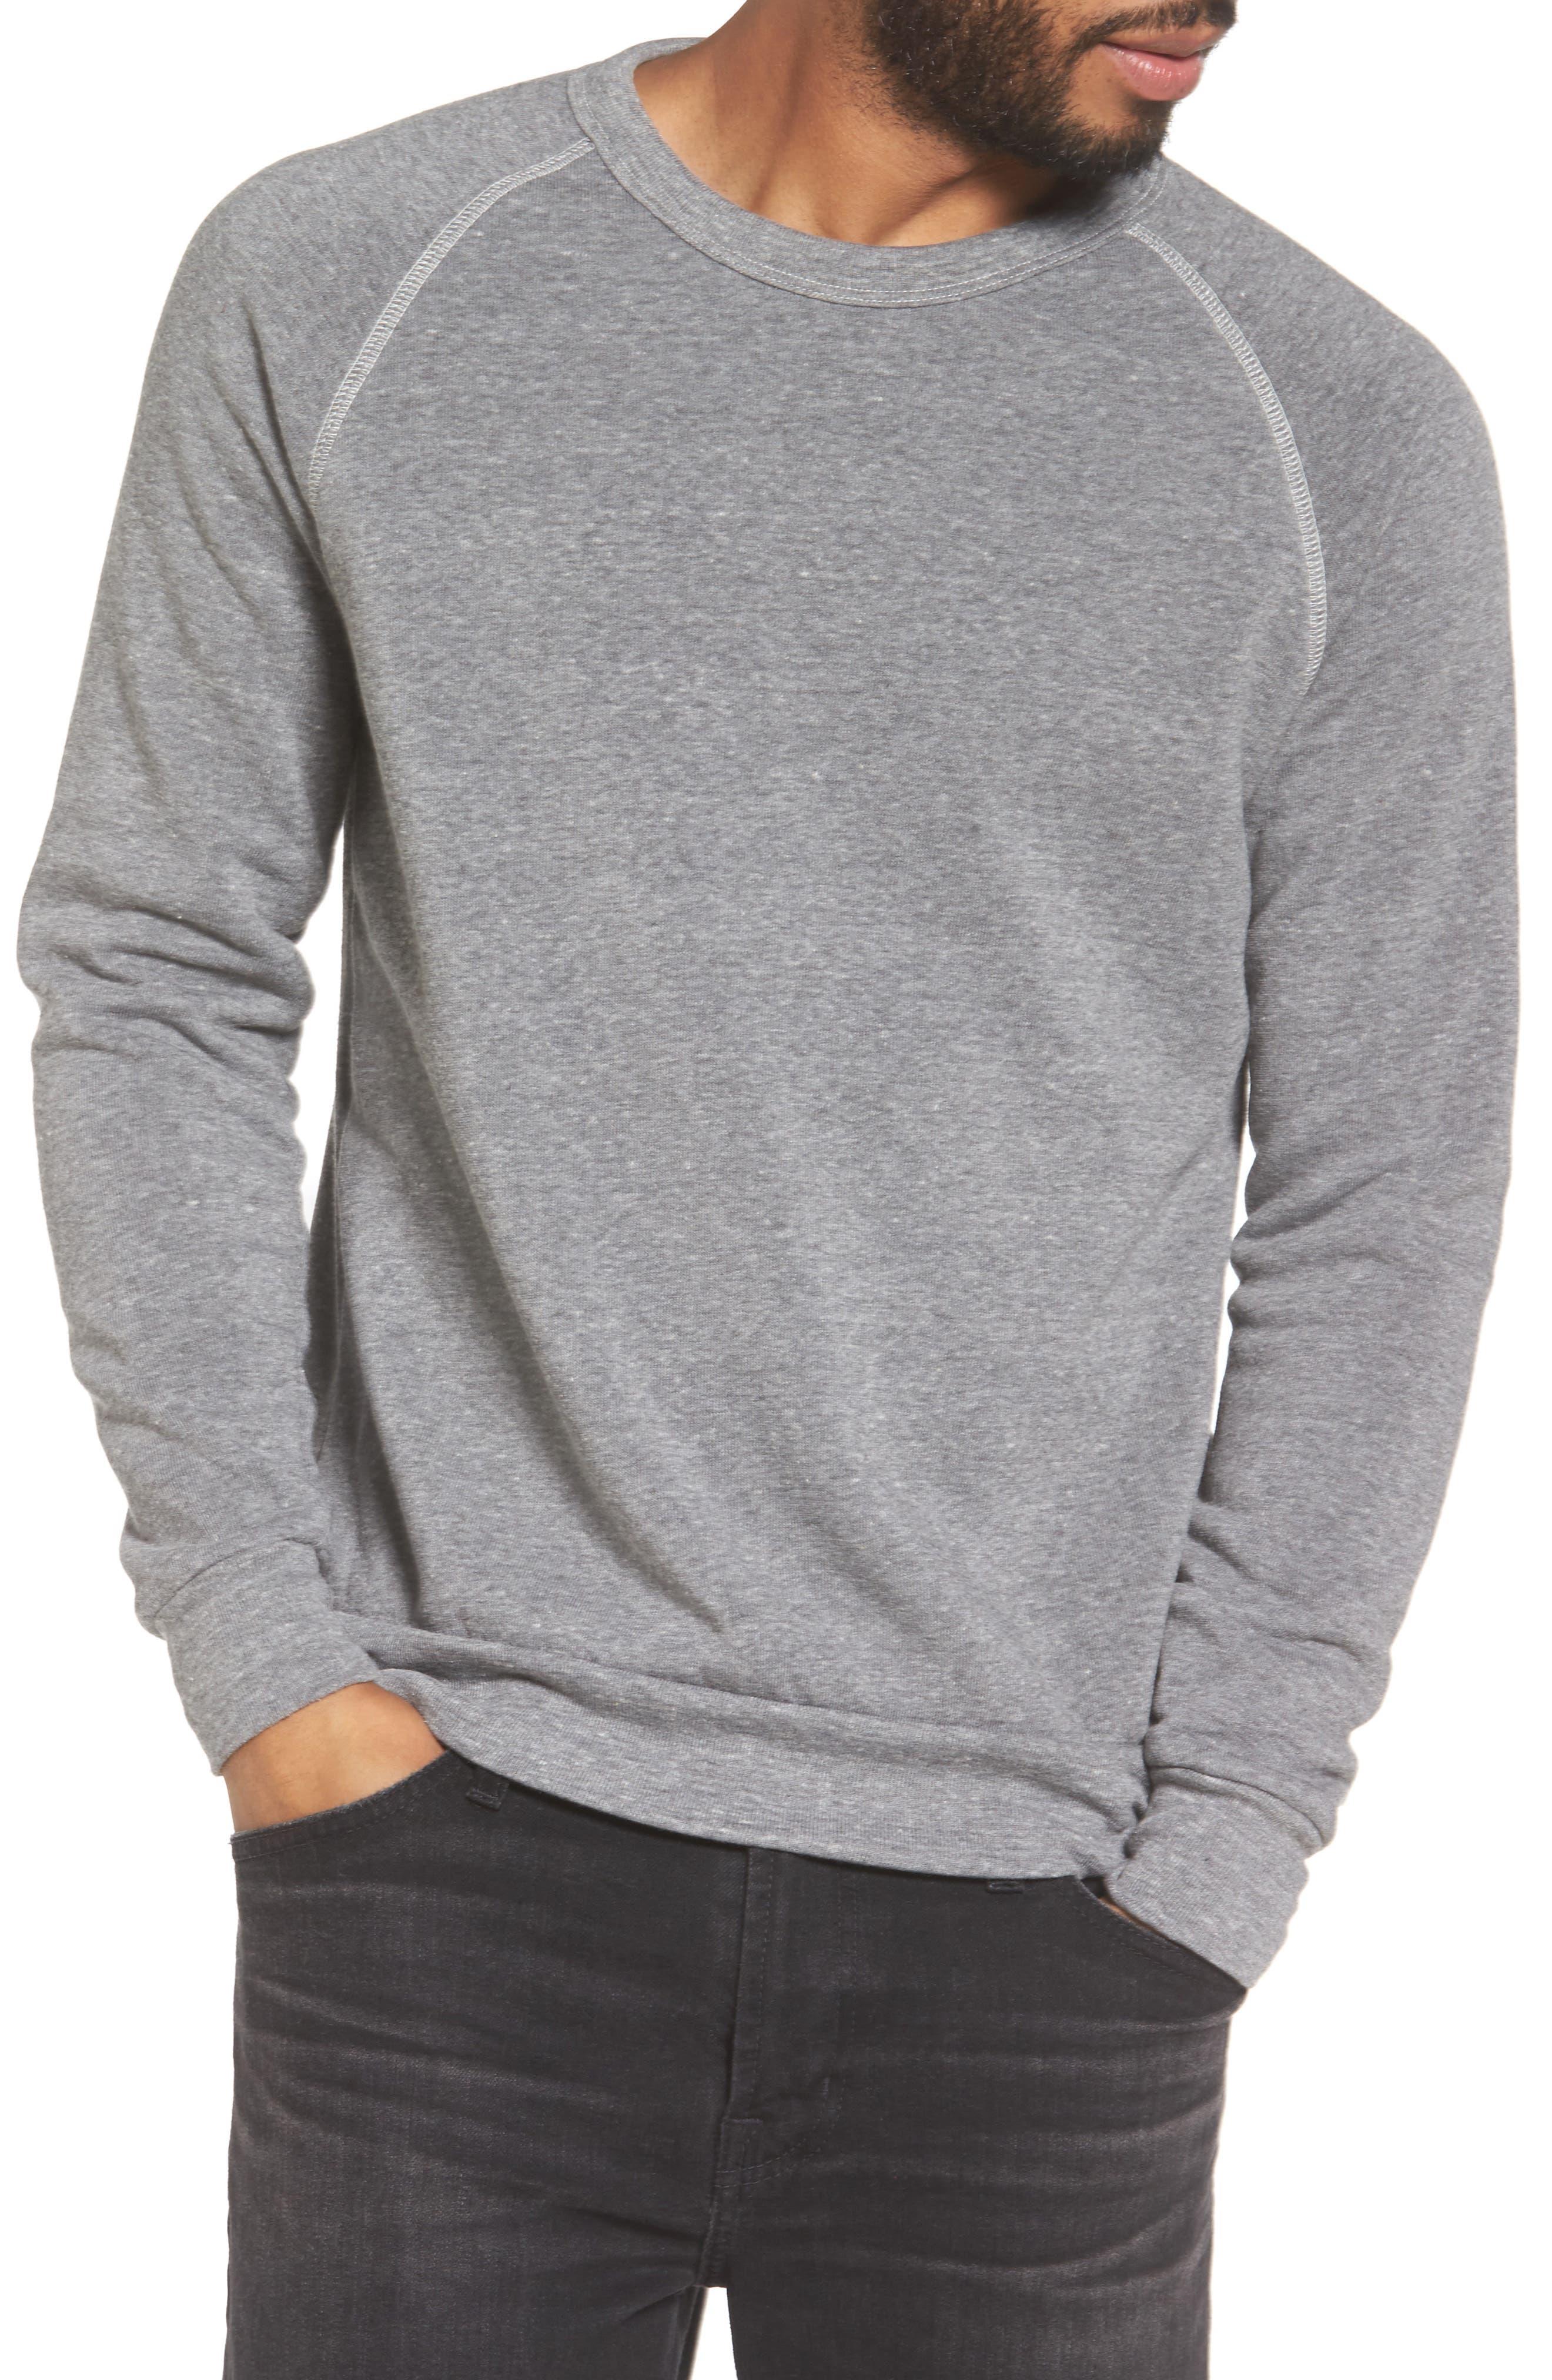 'The Champ' Sweatshirt,                             Alternate thumbnail 19, color,